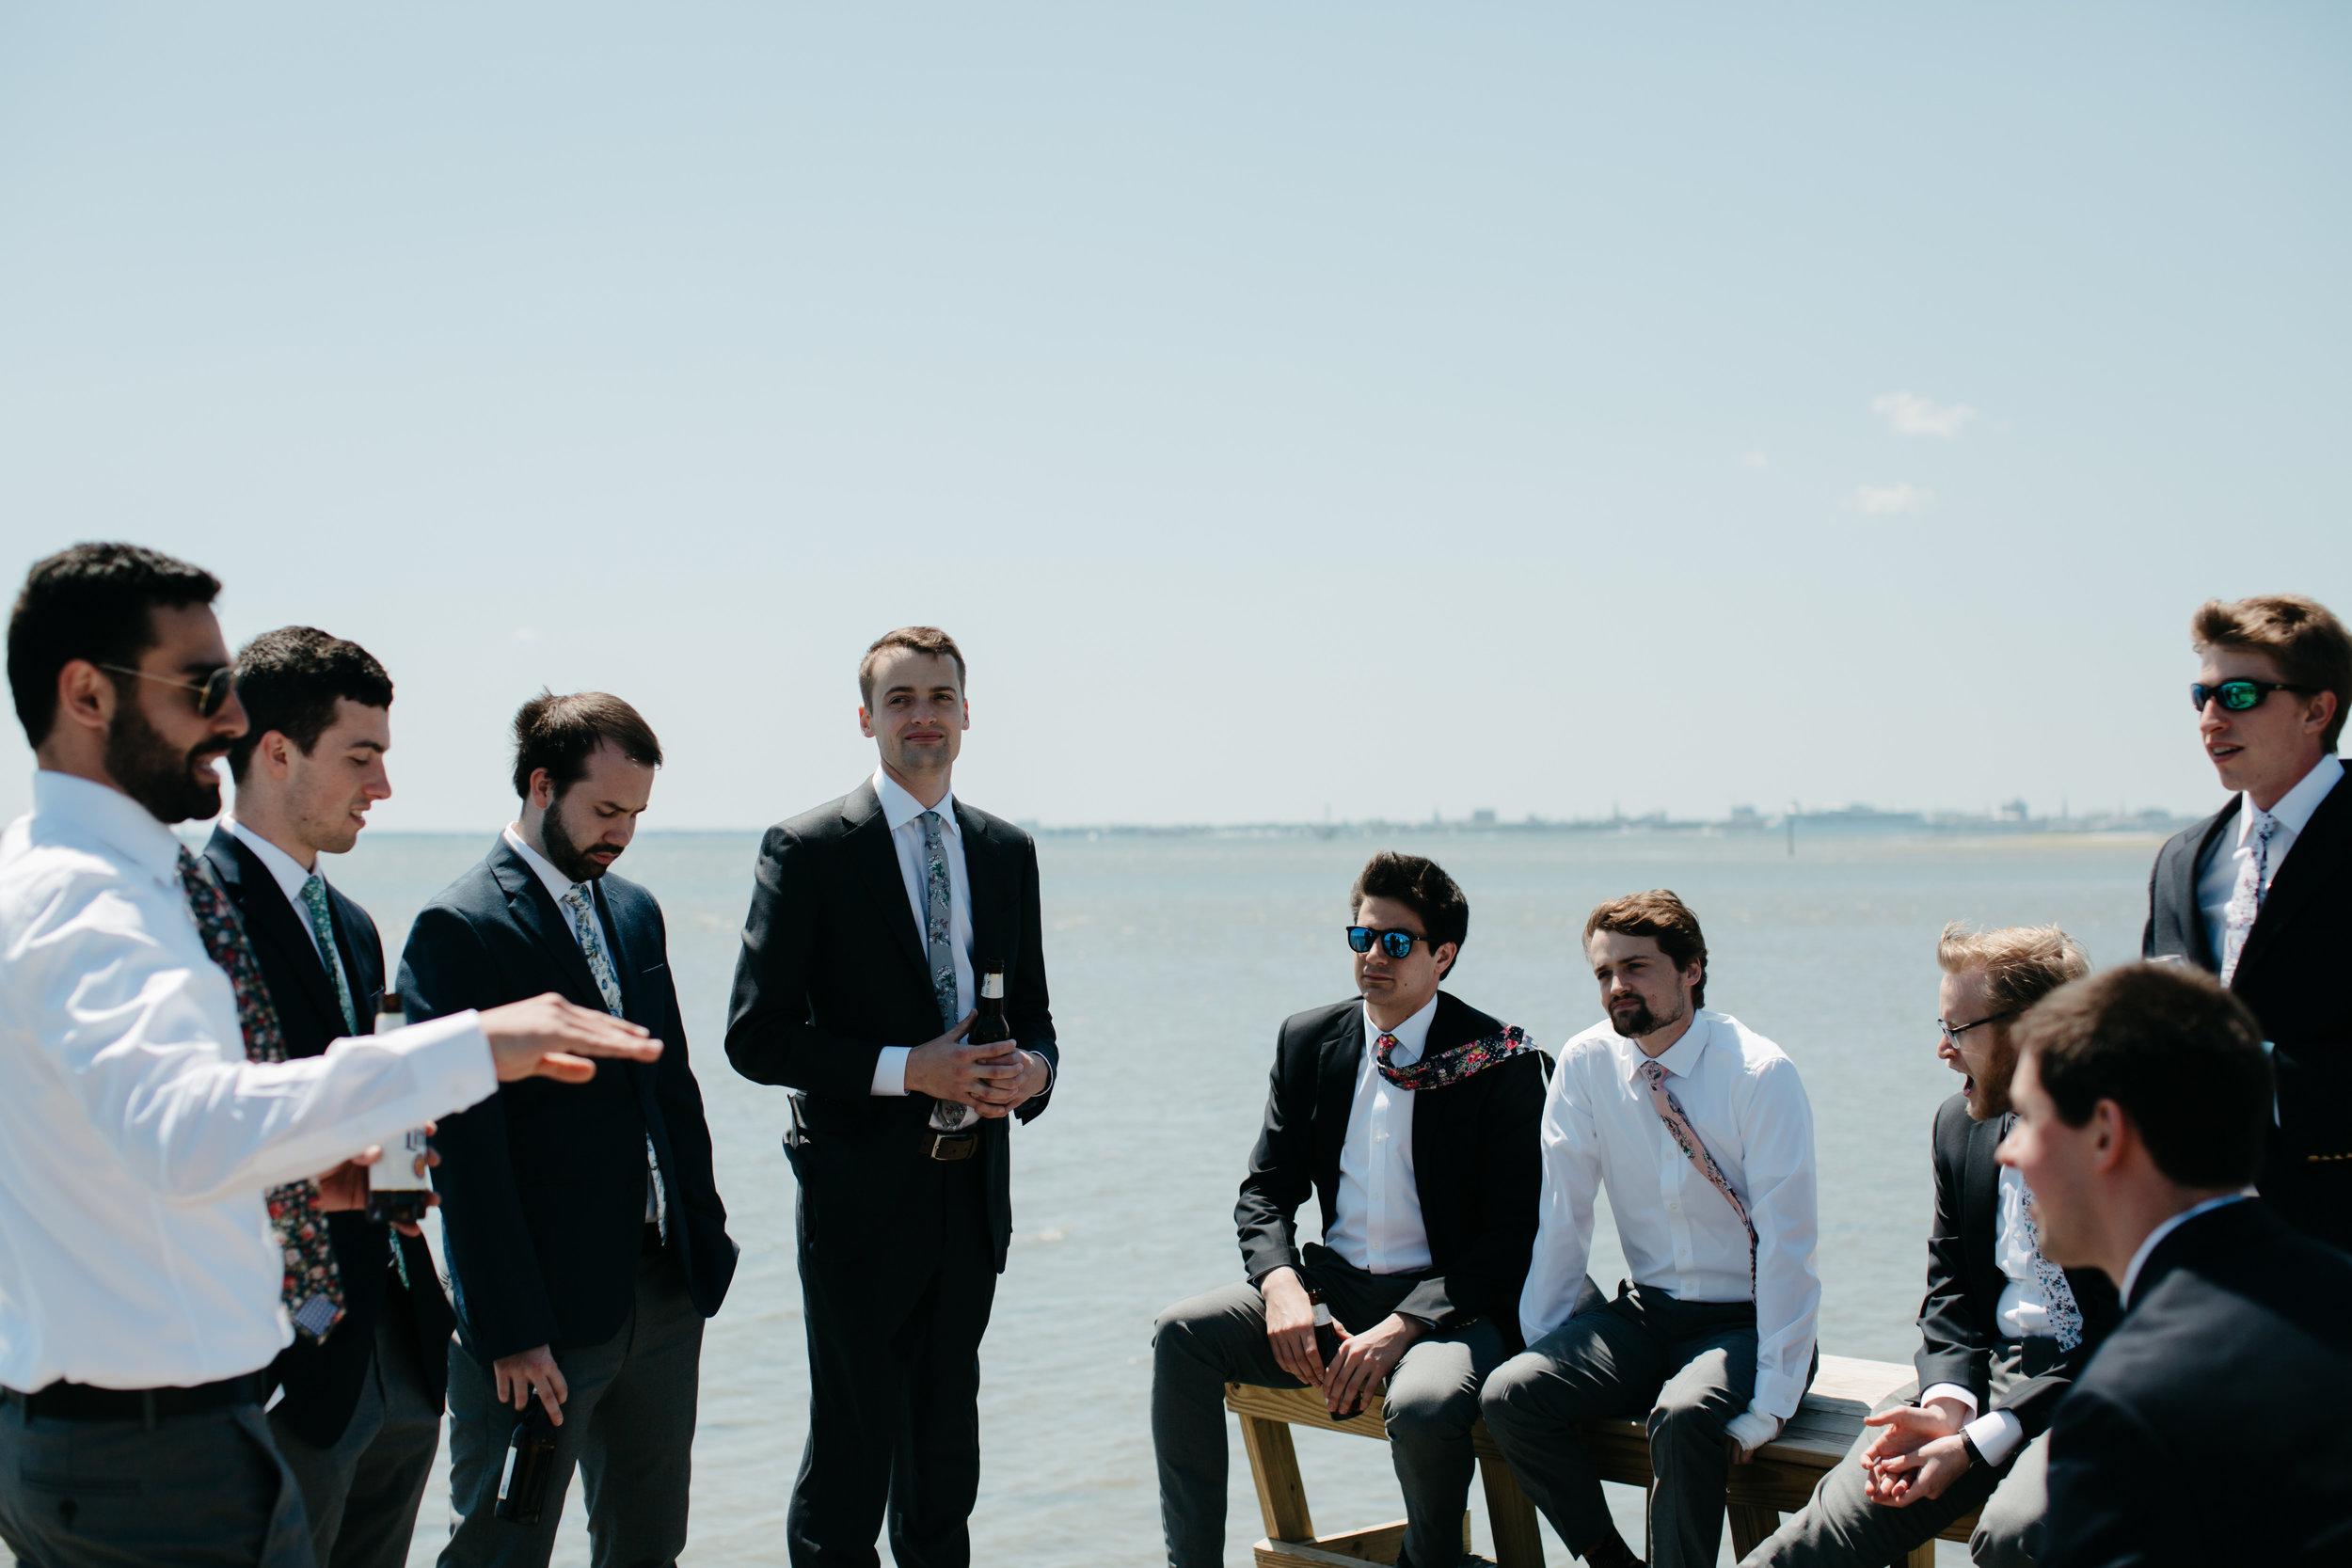 paraiso-event-design-charleston-mount-pleasant-waterfront-wedding-private-home-03.jpg